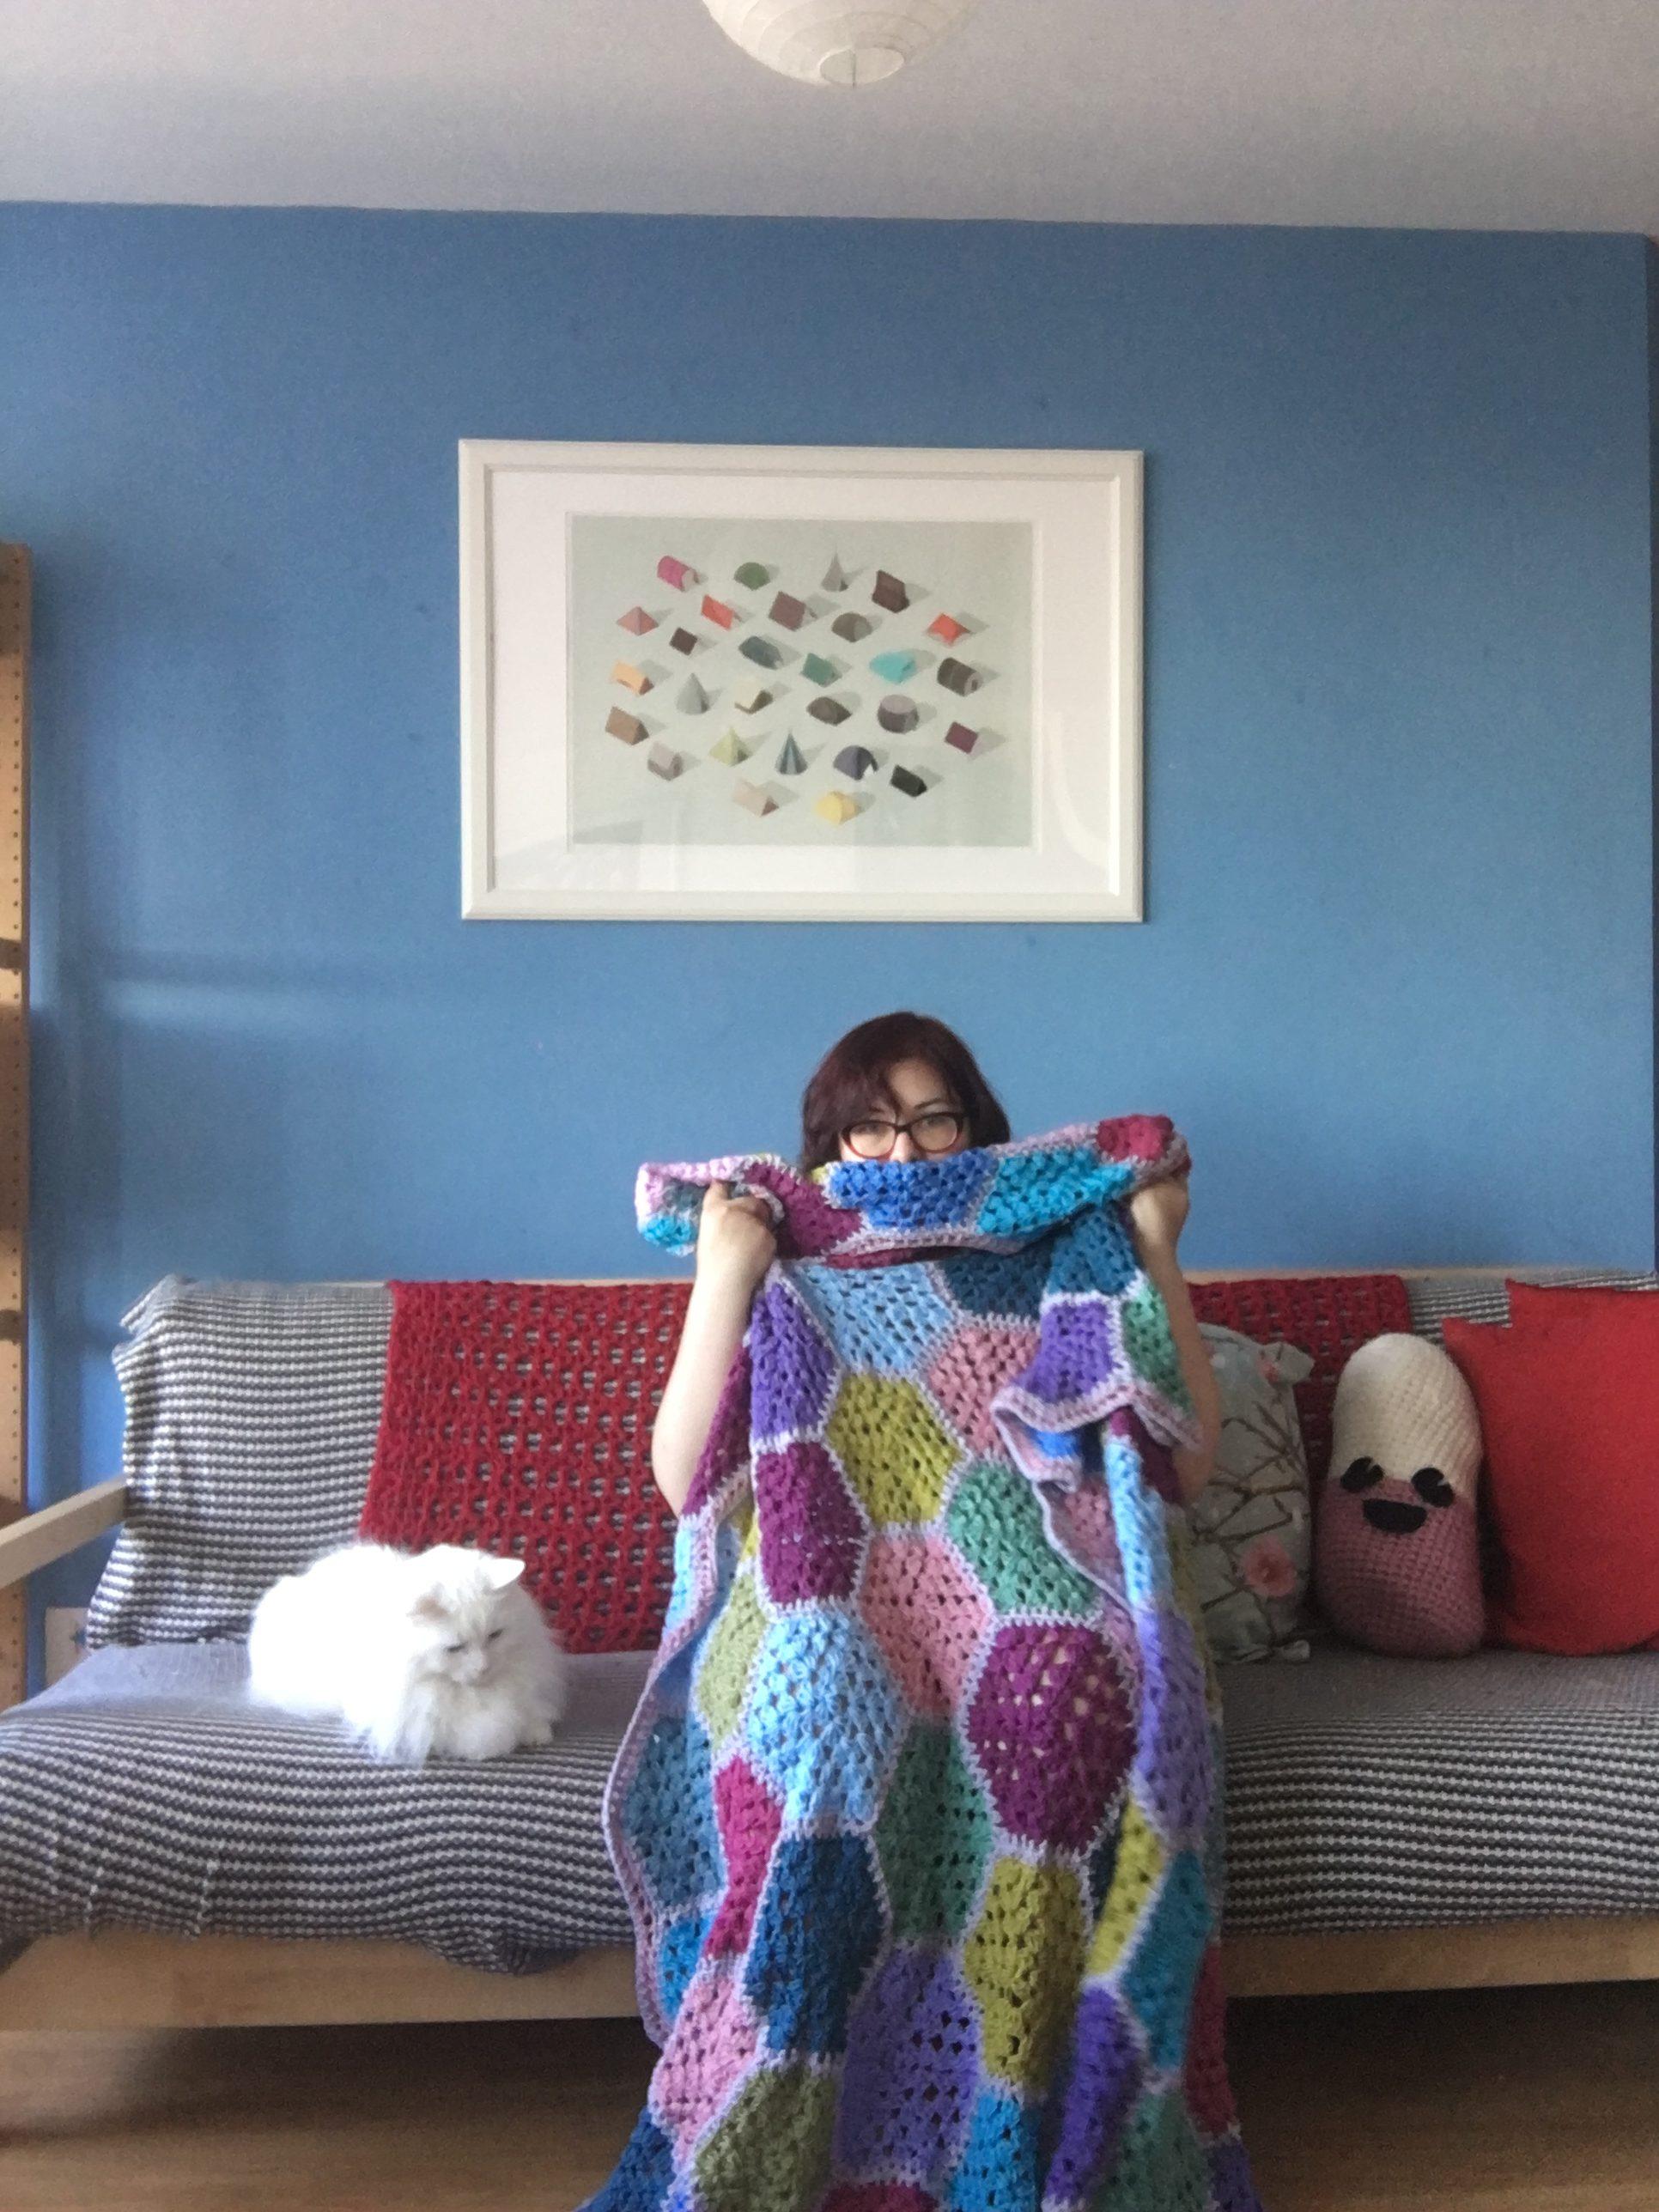 Granny square crochet blanket to snuggle under